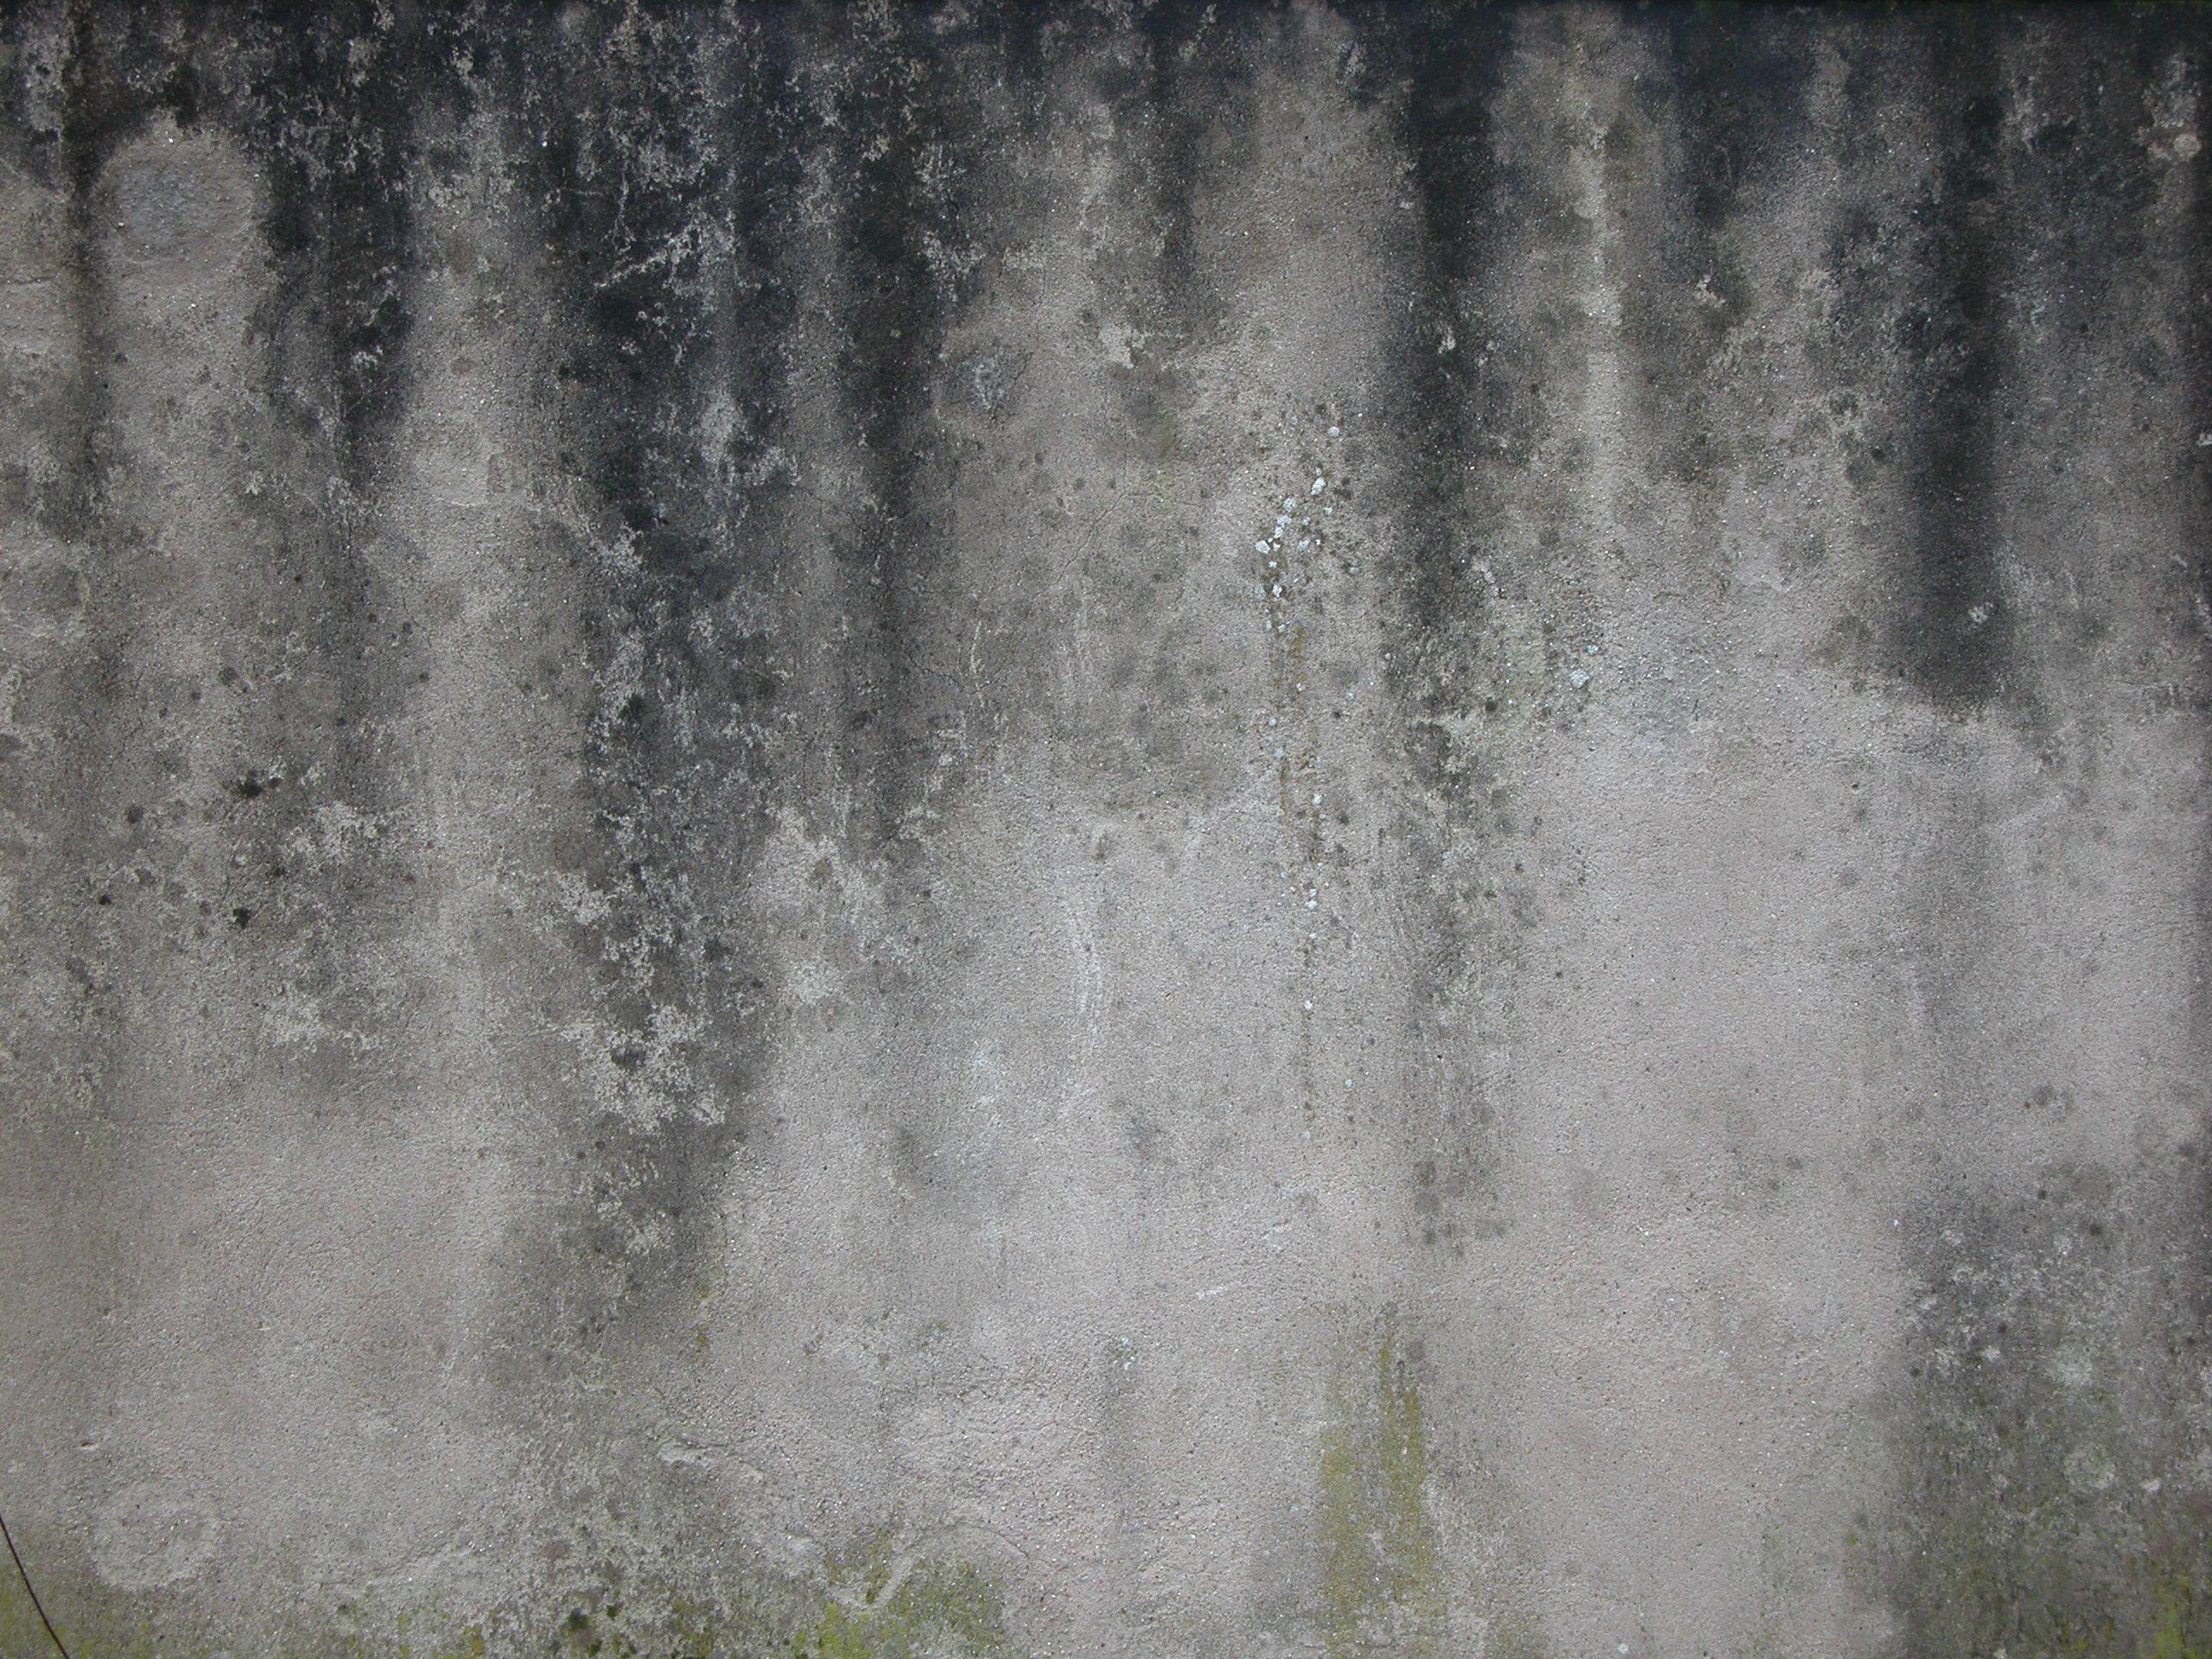 concrete dirty wall texture | Set ideas concrete | Pinterest | Wall ...